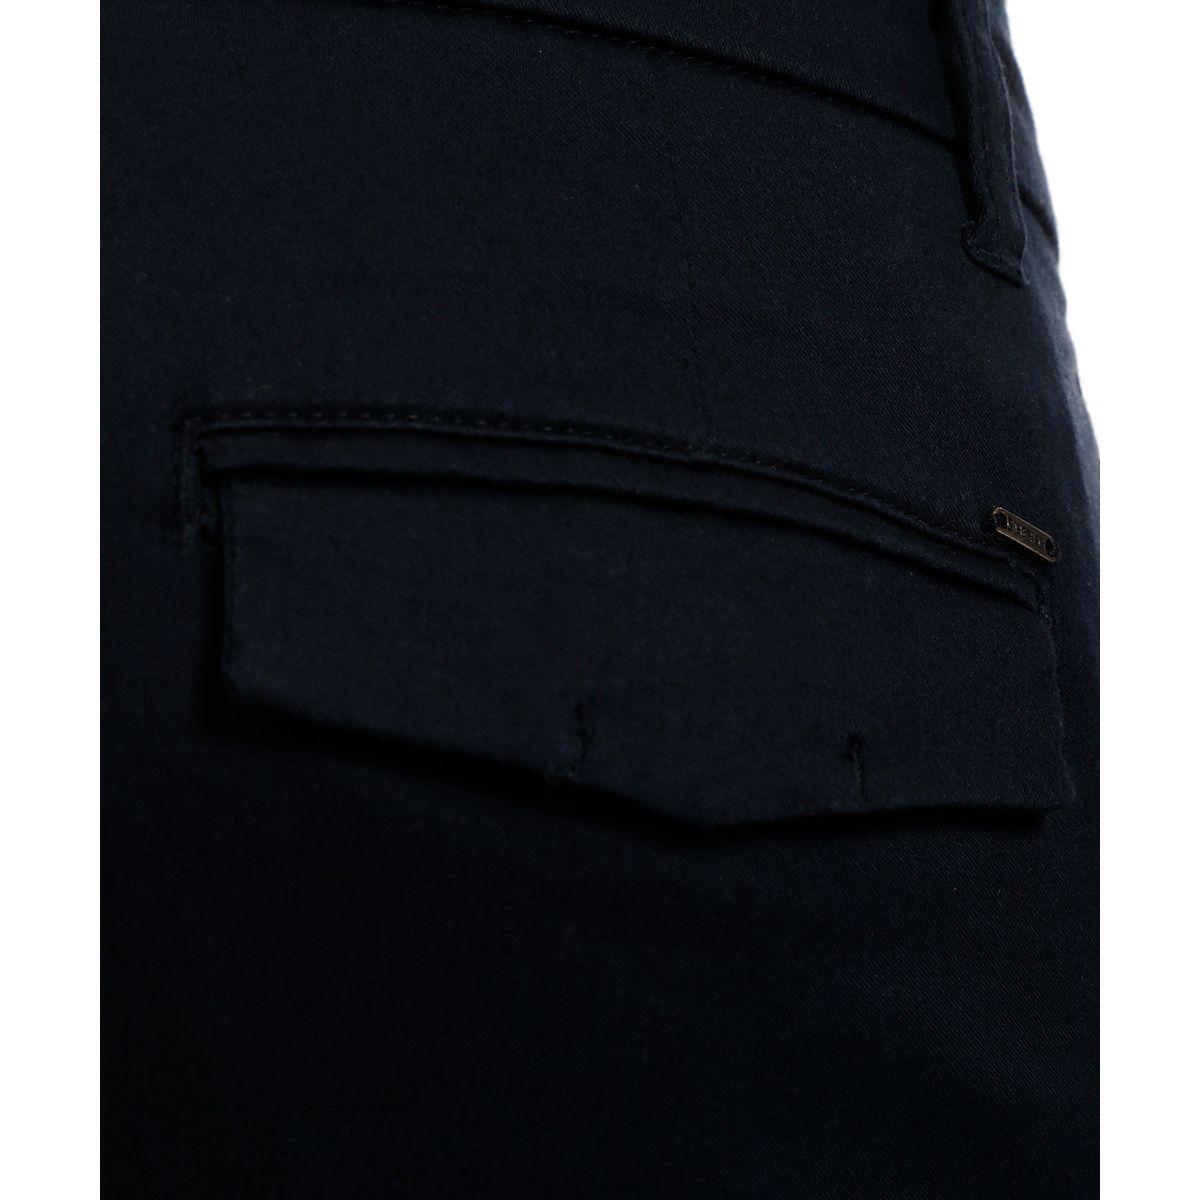 Calca-Chino-Azul---40